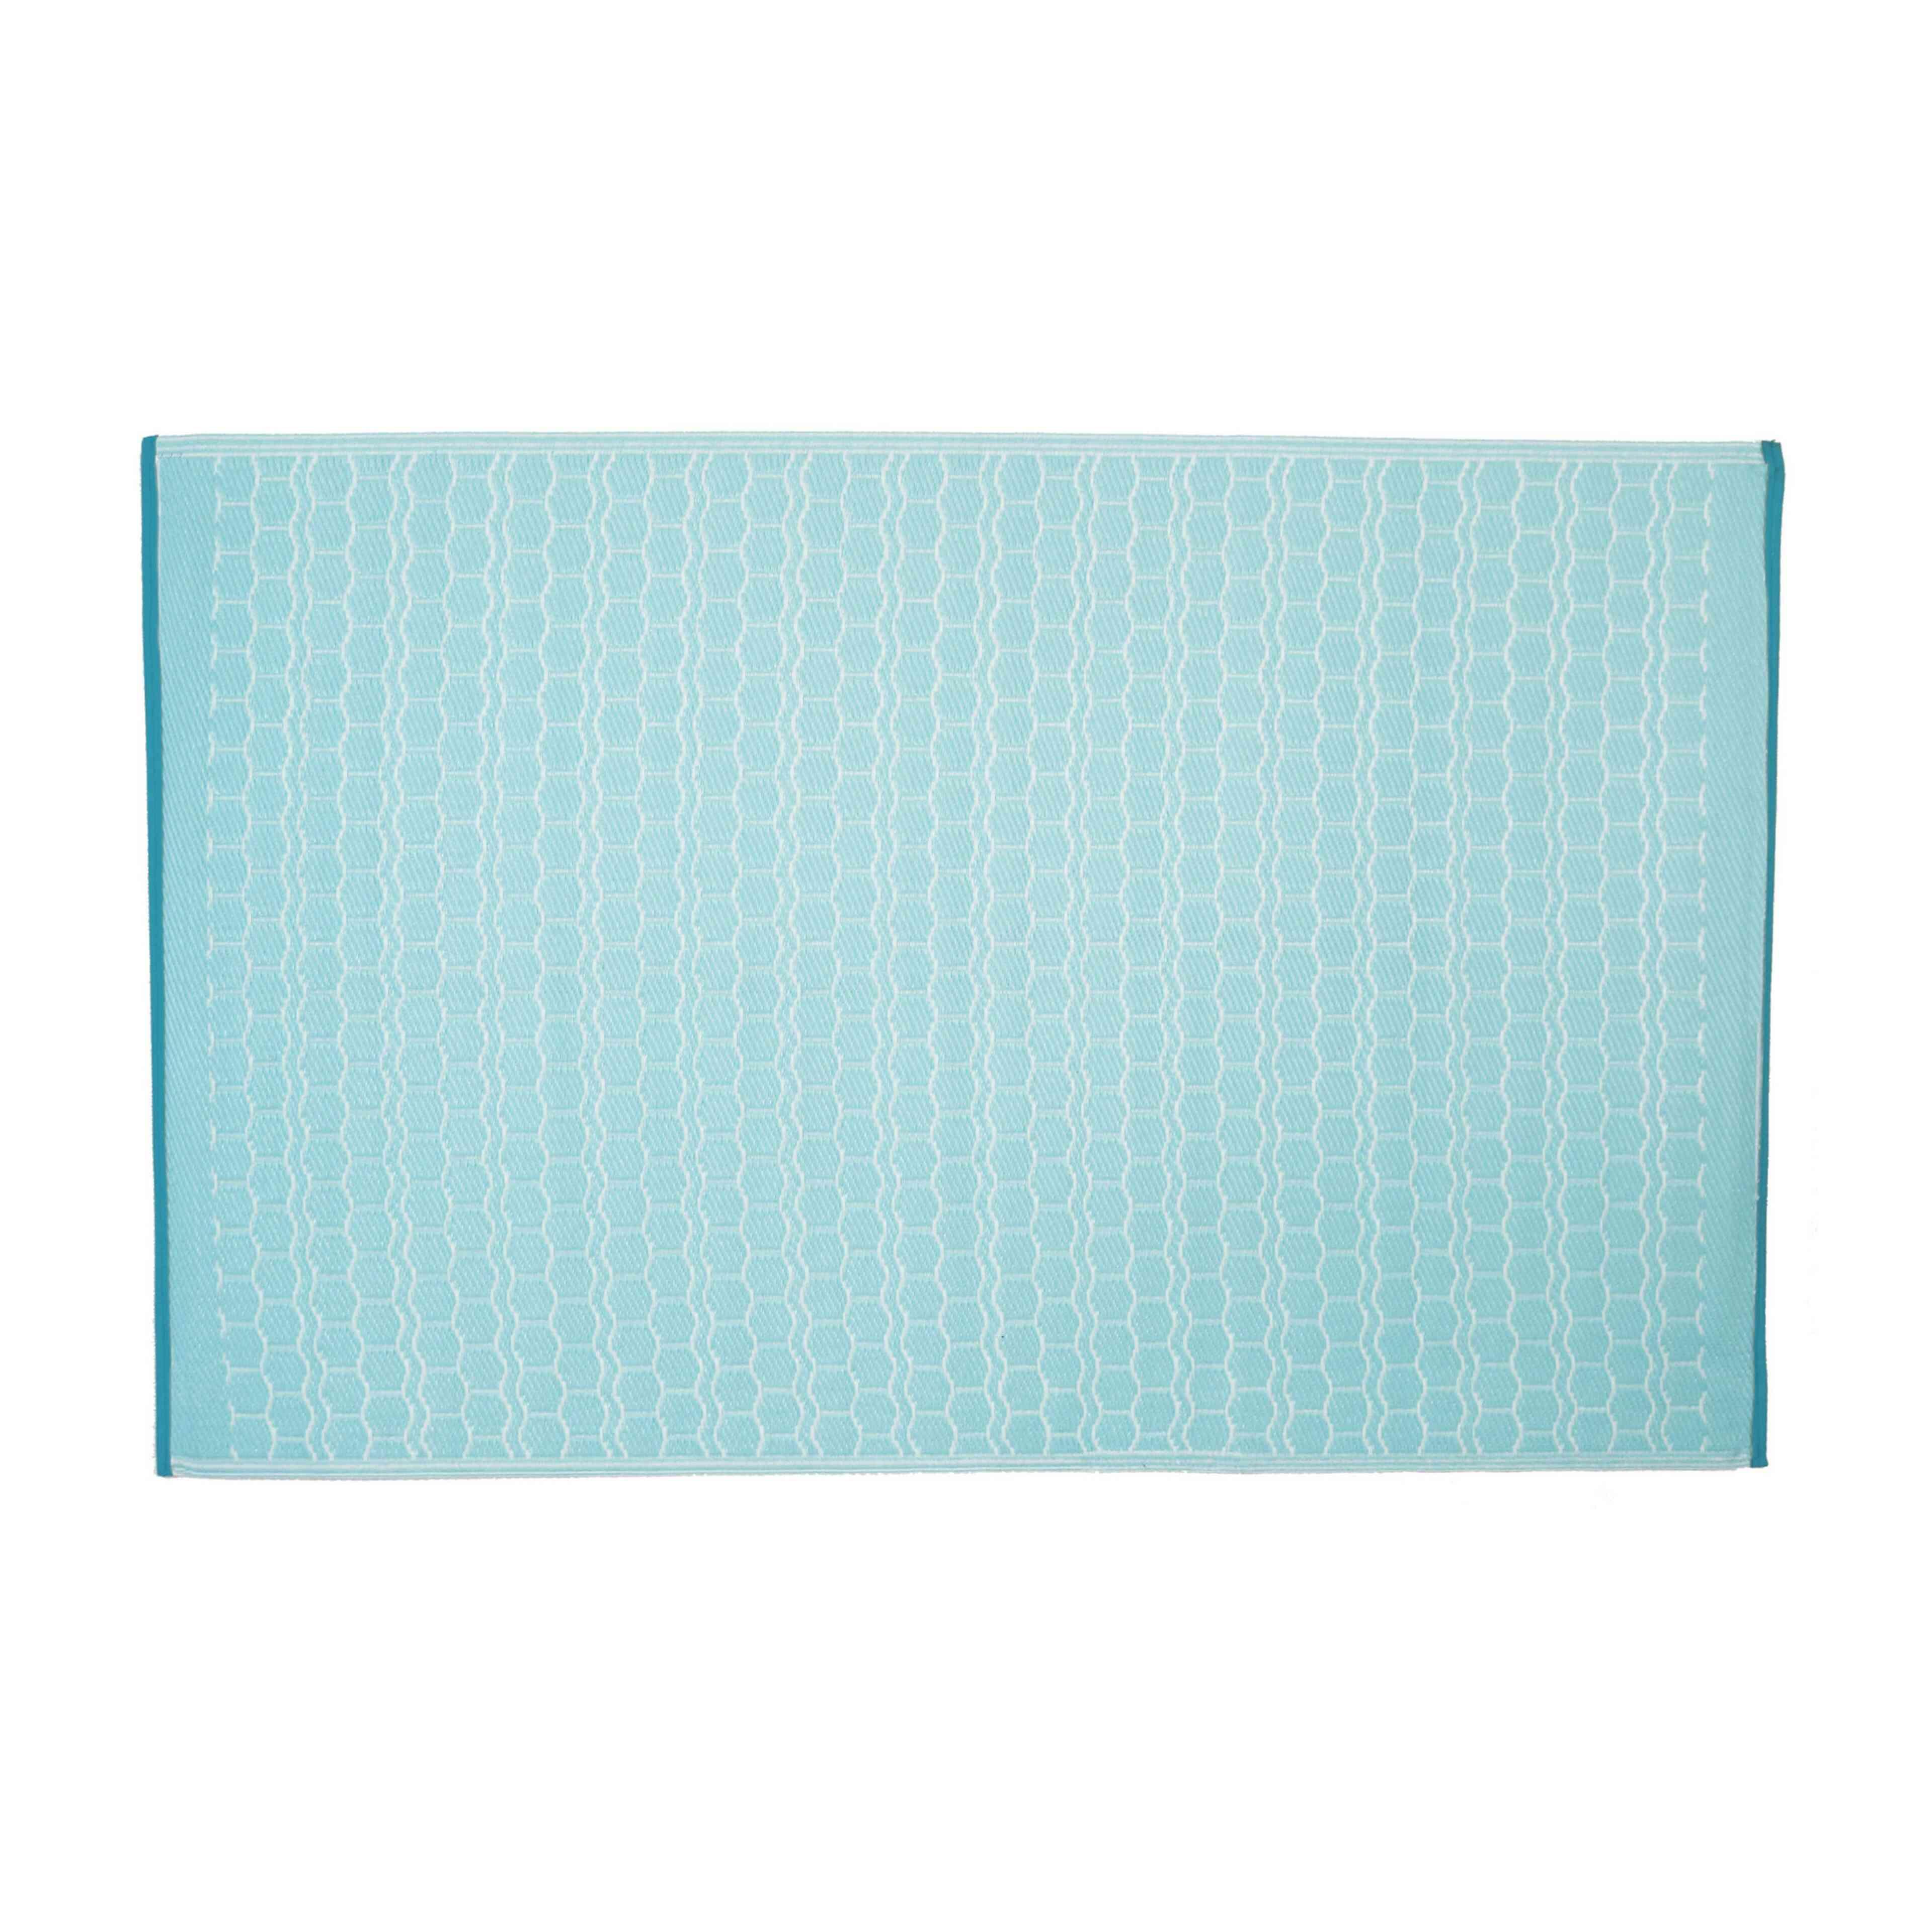 tapis ext rieur bleu pvc solys. Black Bedroom Furniture Sets. Home Design Ideas